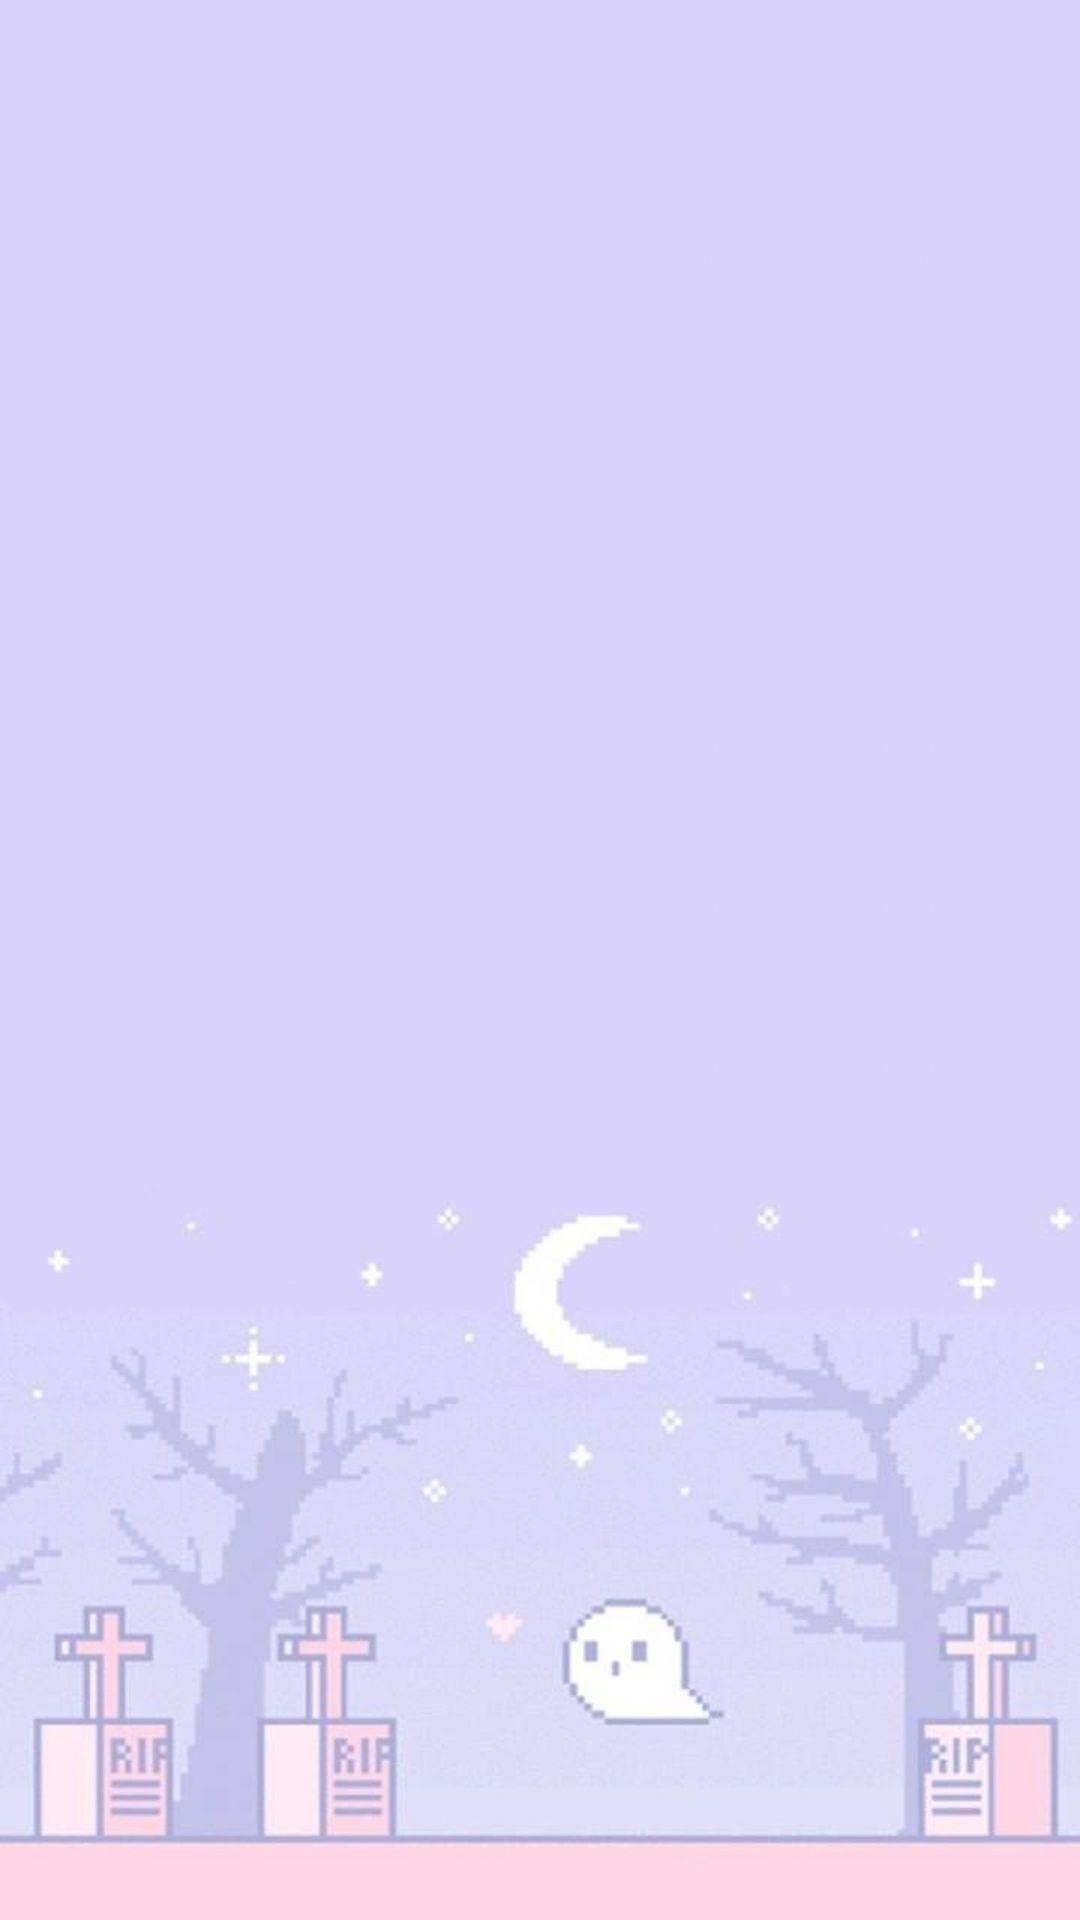 Halloween Android Iphone Desktop Hd Backgrounds Wallpapers 1080p 4k 118216 Hdwallpa Backgrounds Tumblr Pastel Goth Wallpaper Cute Pastel Wallpaper